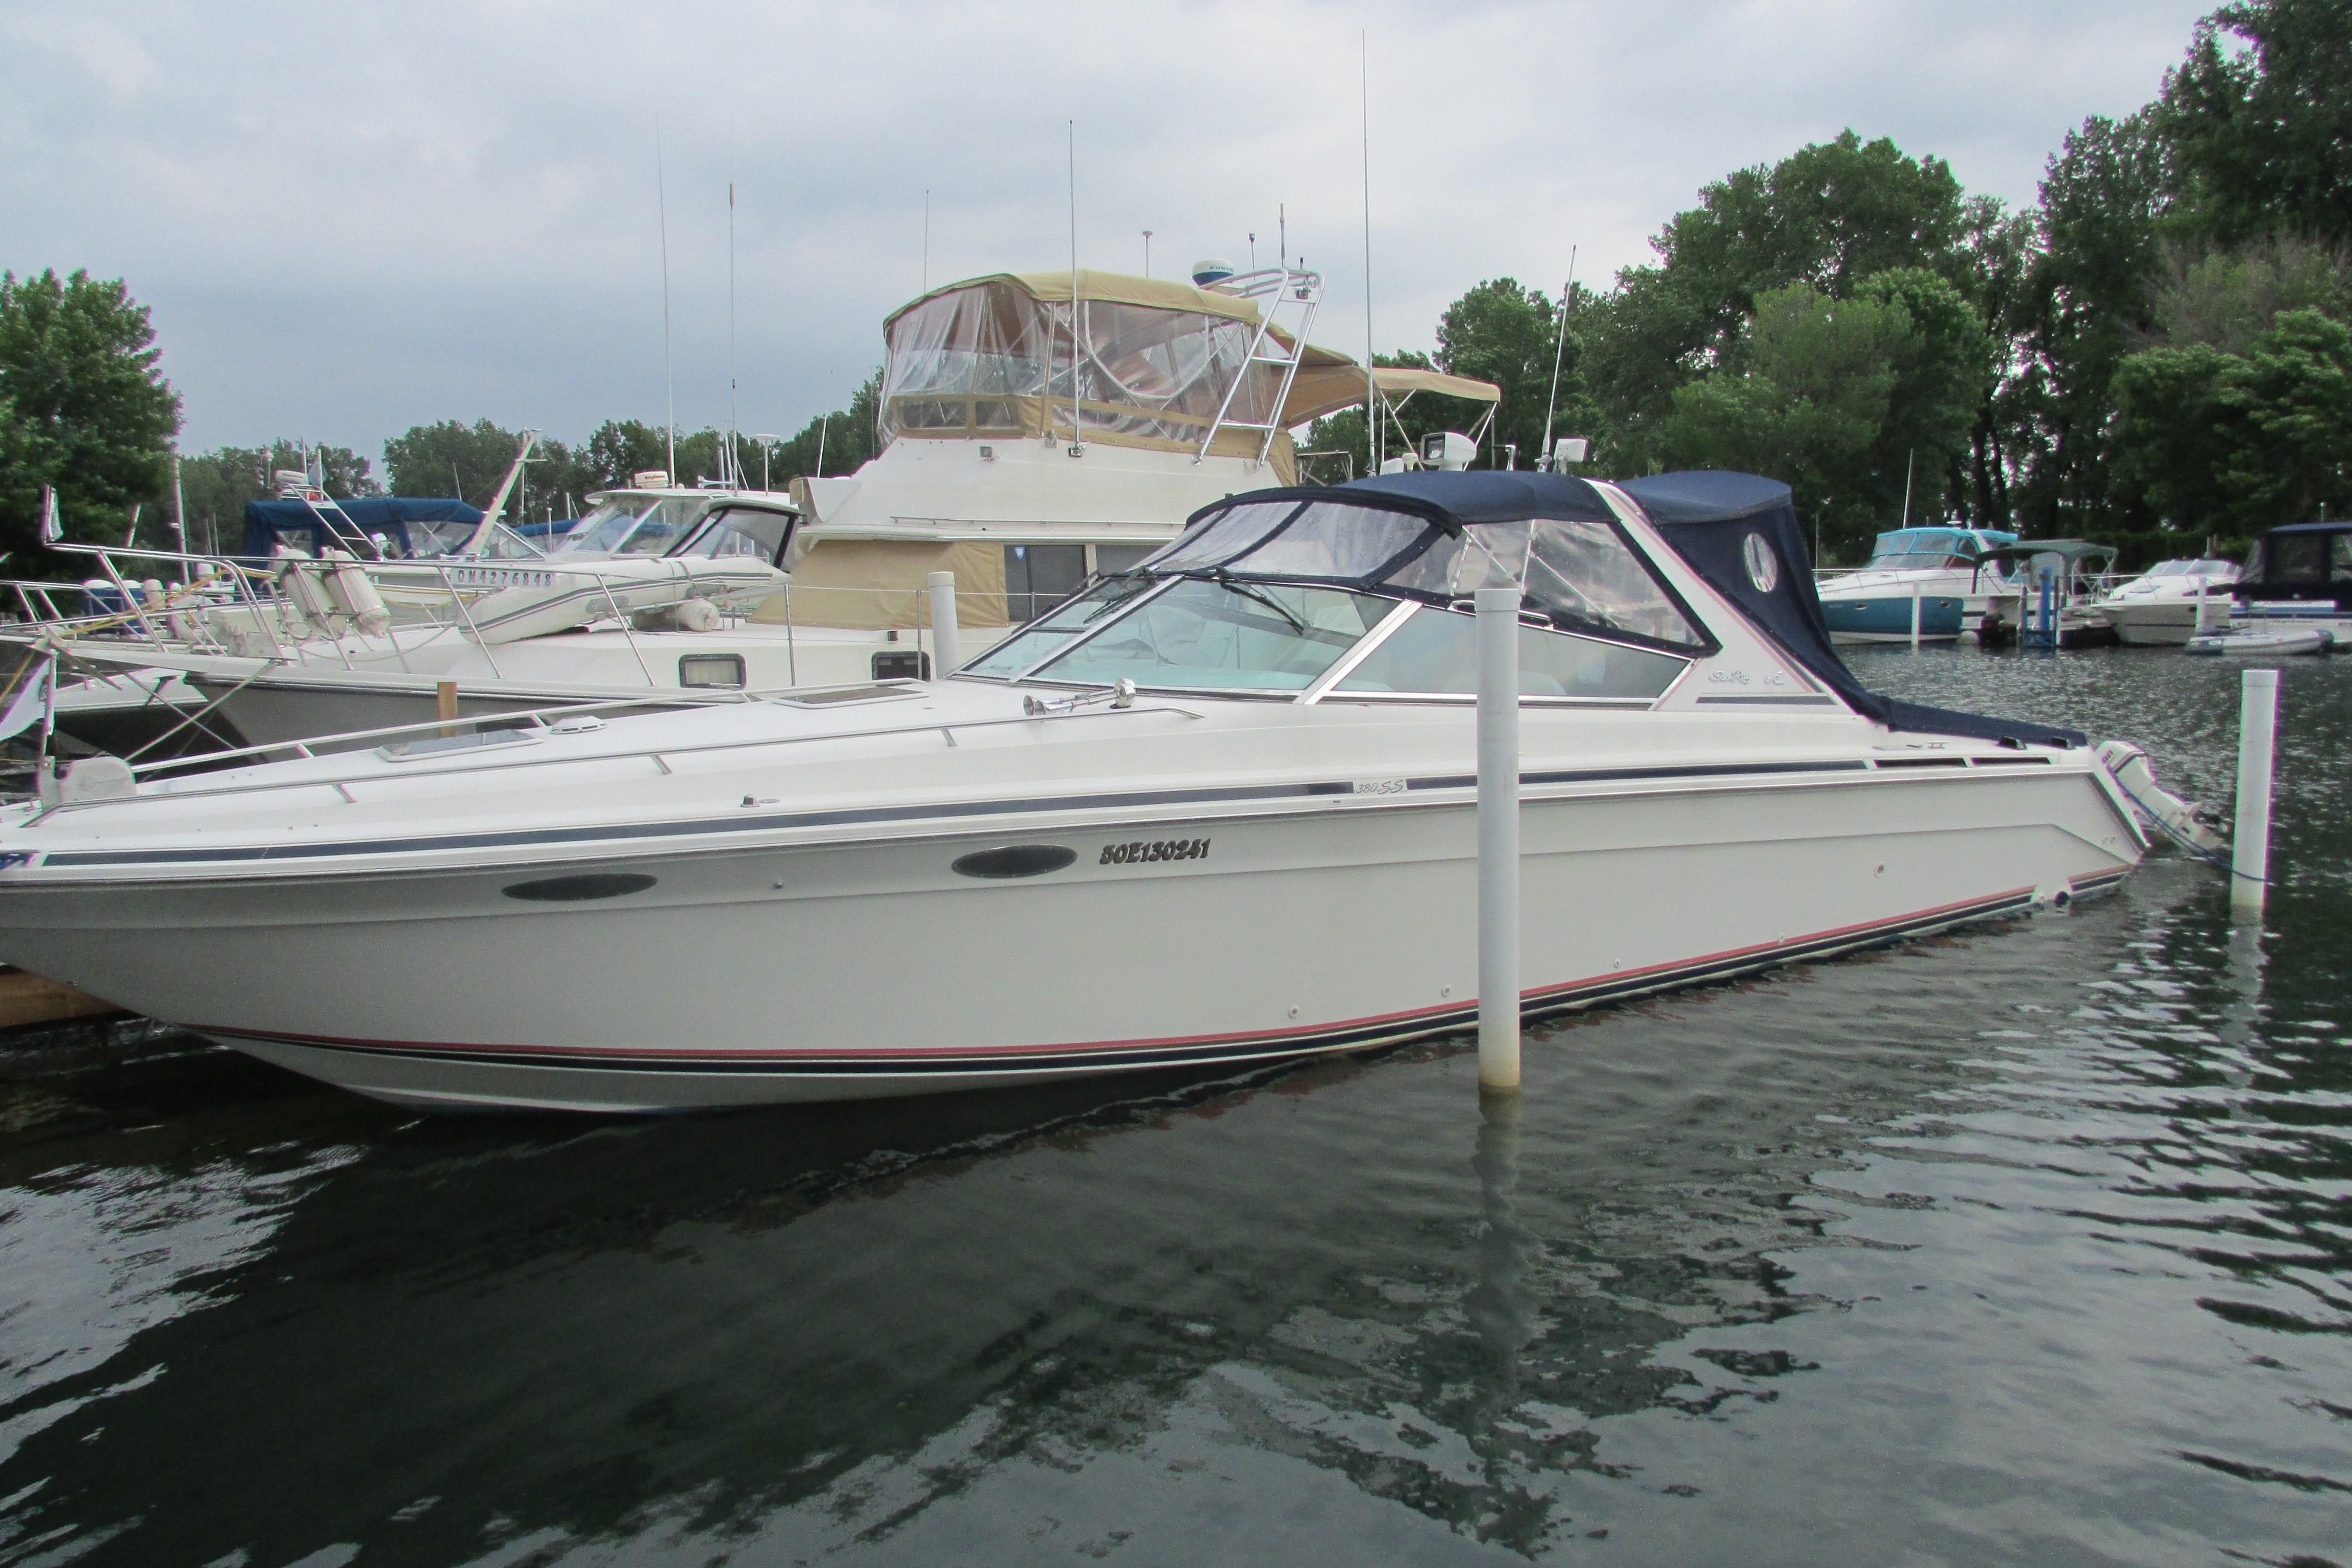 1995 Sea Ray 380 Sun Sport Power Boat For Sale Www Yachtworld Com